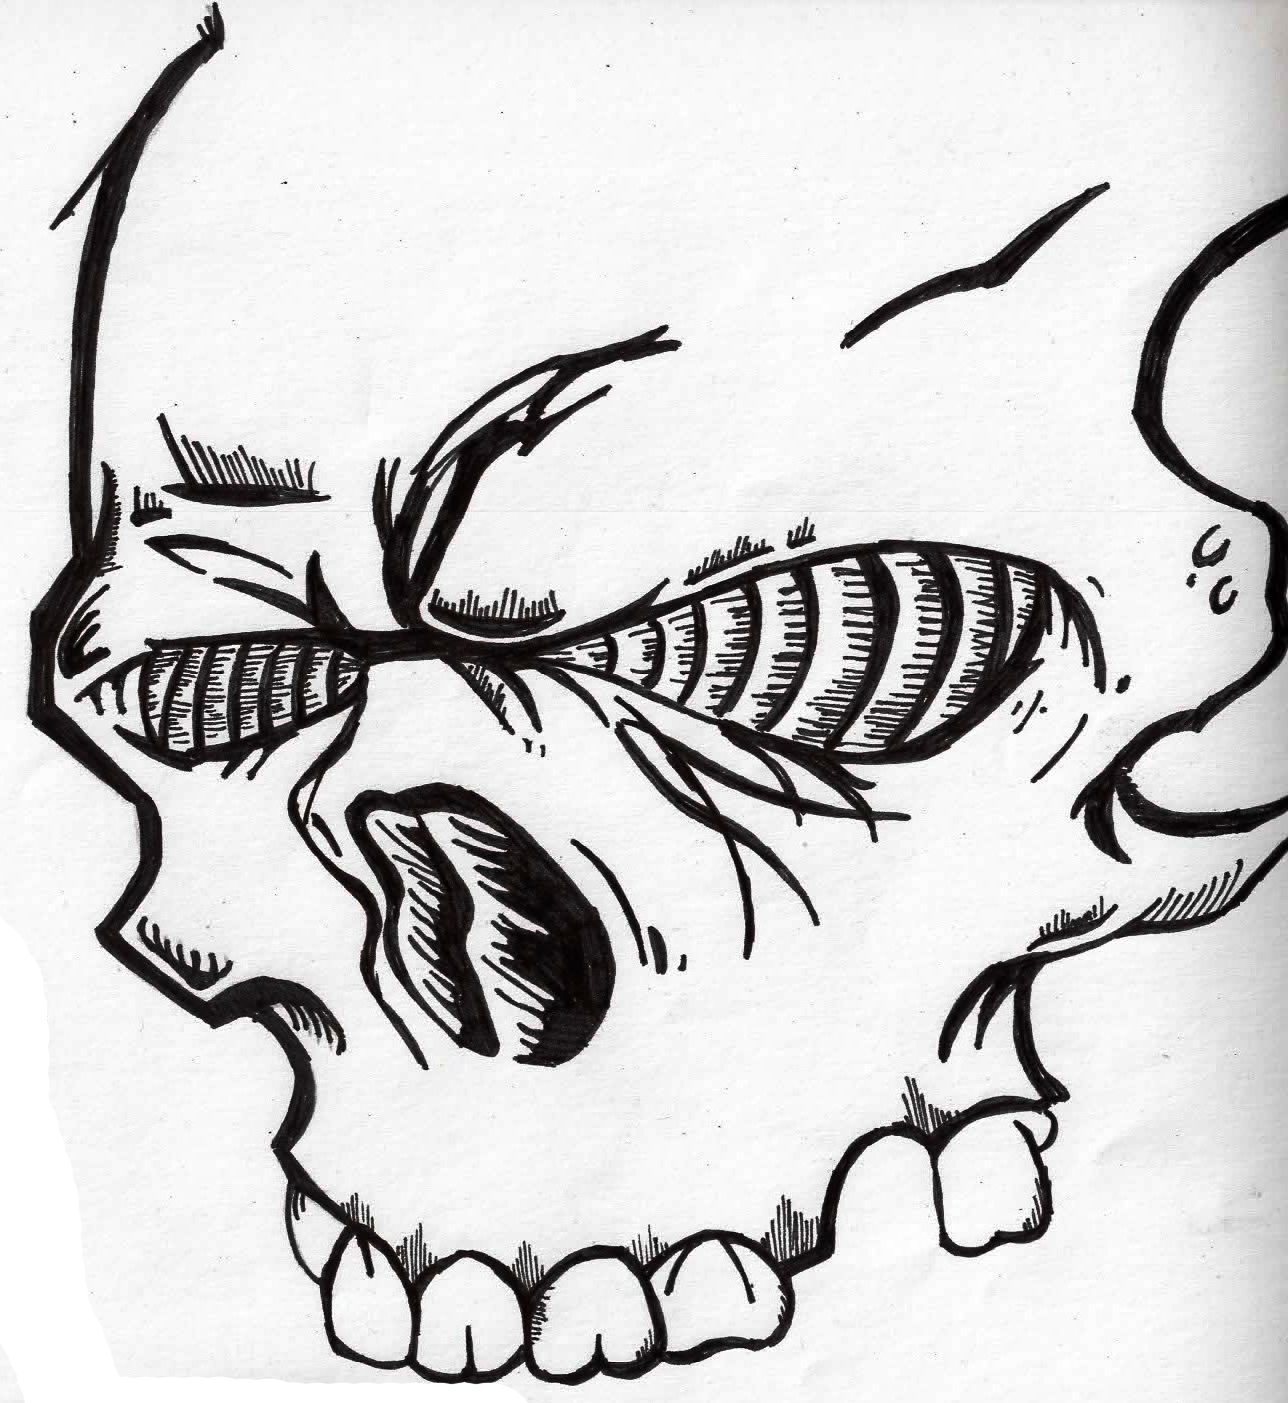 1288x1403 Graffiti Skulls Drawings Skulls Drawing Graffiti How To Draw